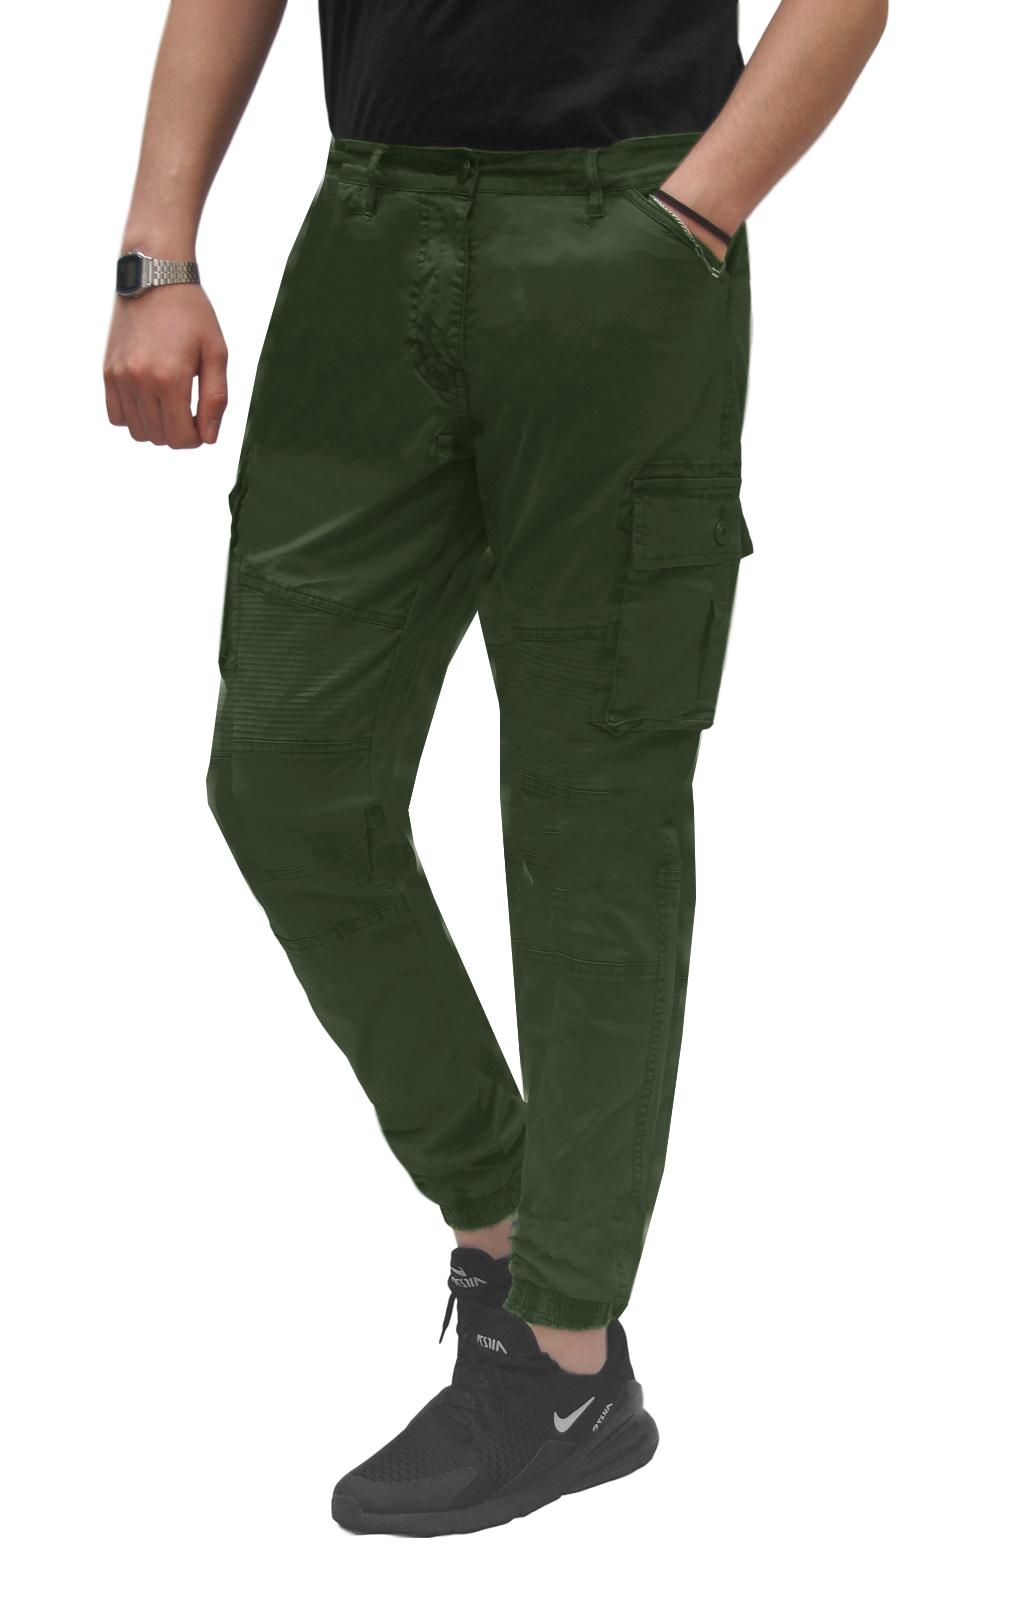 Pantalone-Uomo-Cargo-Con-Tasconi-Invernale-Verde-Blu-Nero-Marrone-Pantaloni-slim miniatura 23